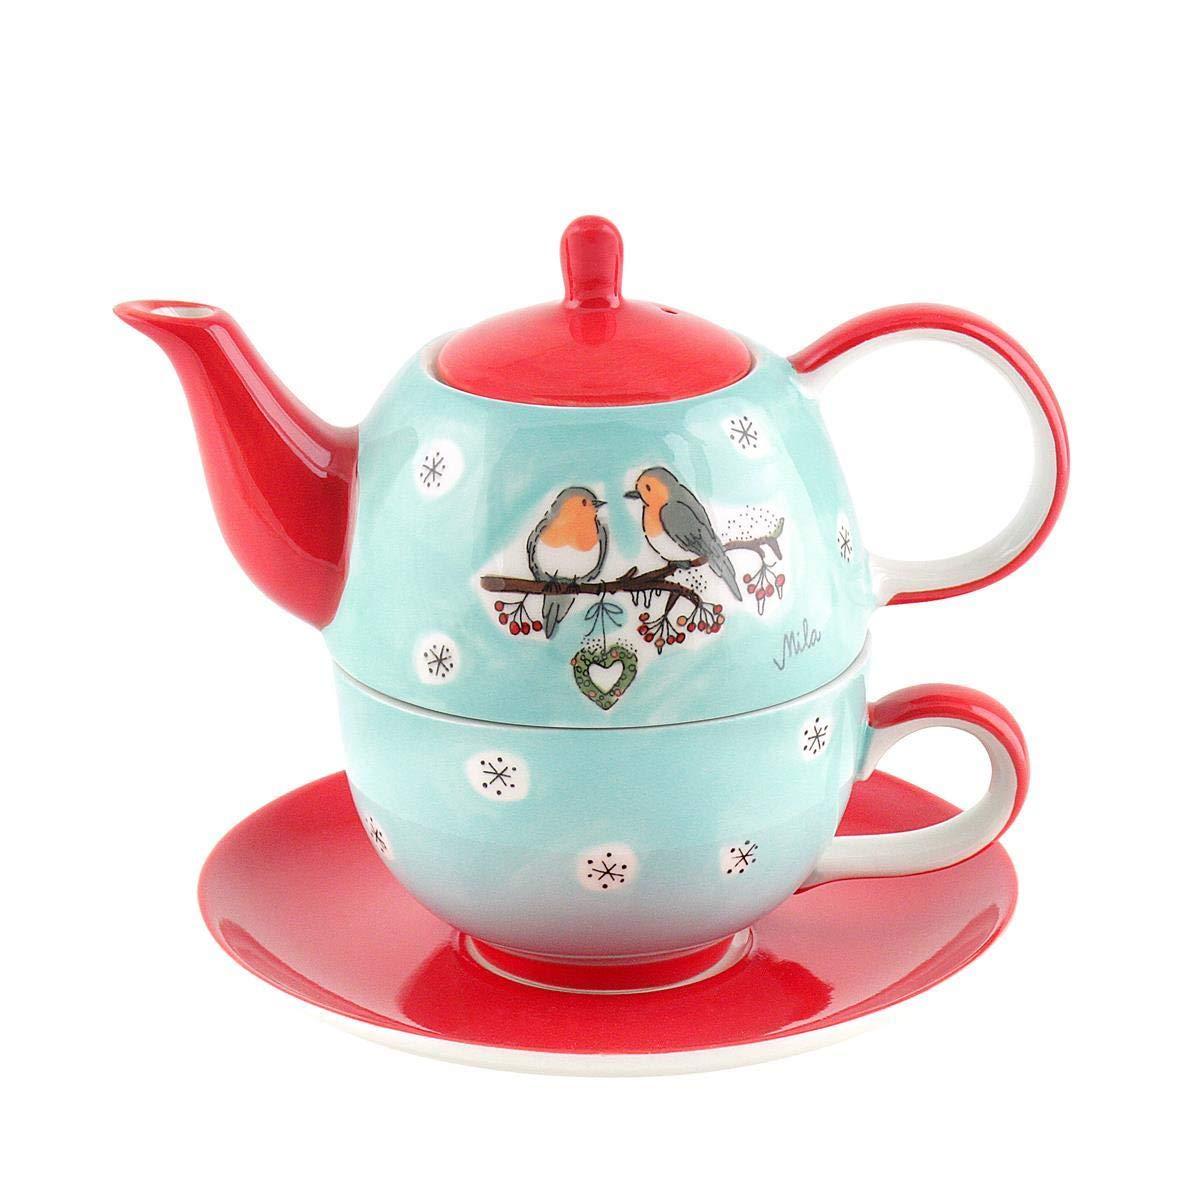 Mila Keramik Tee-Set: Tea for One, Wintervö gel   MI-99158   4045303991583 Mila GmbH